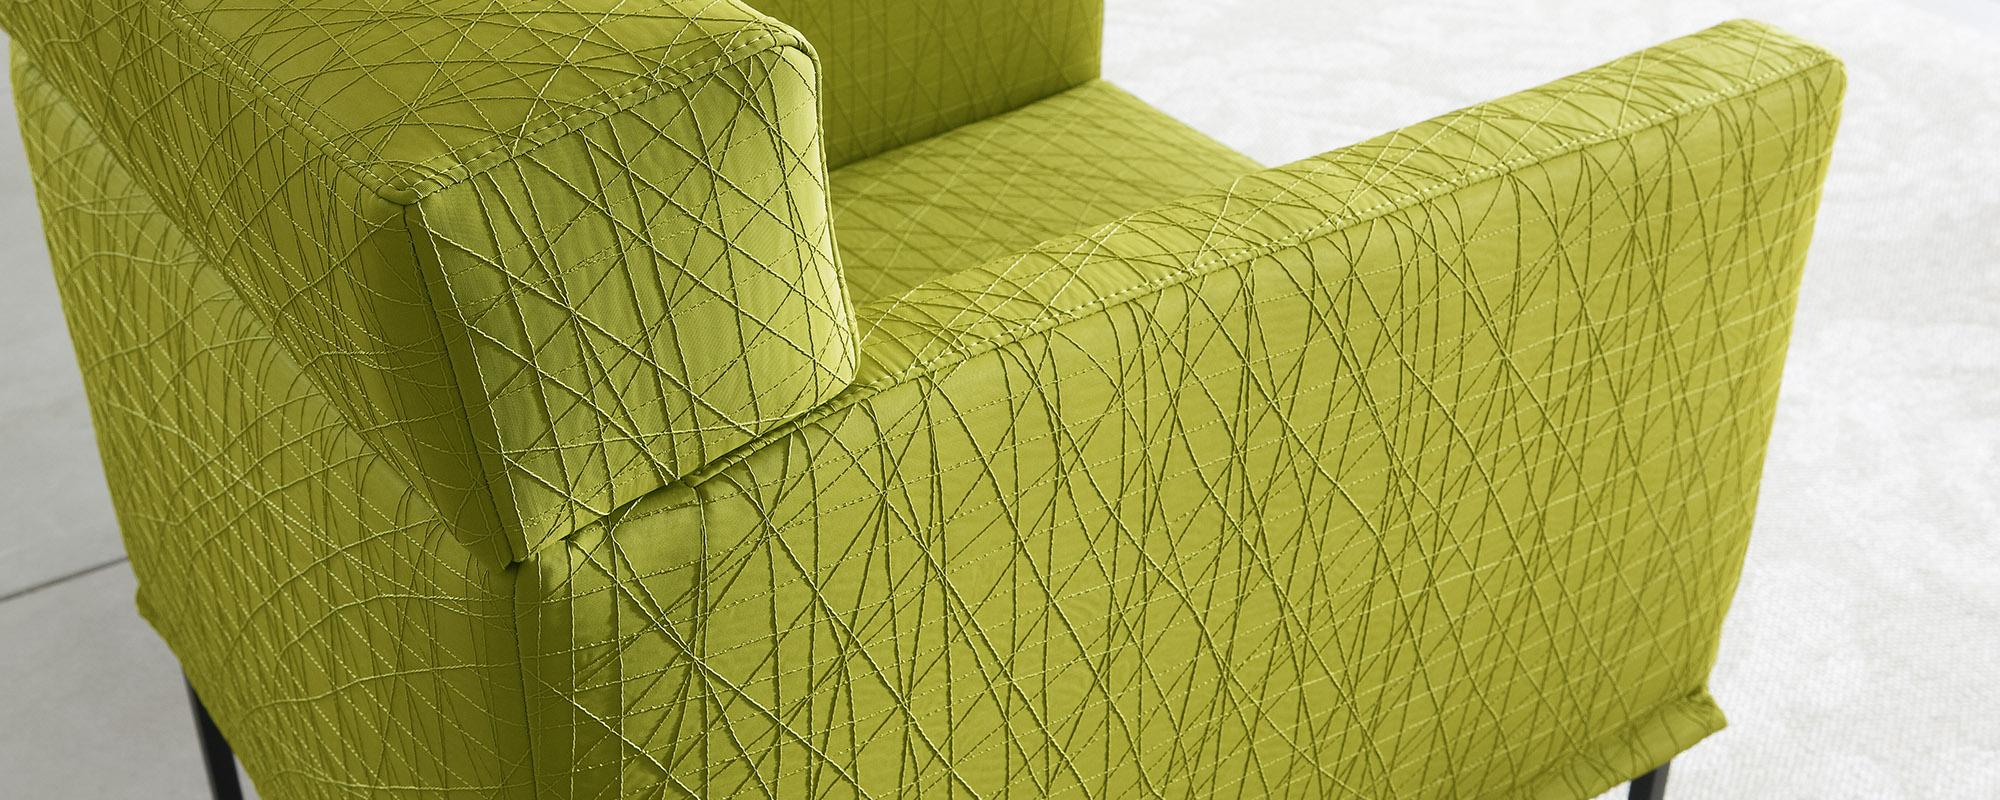 Furniture 0000s 0013 sk Soroma 006 0000 c ssl 00008661